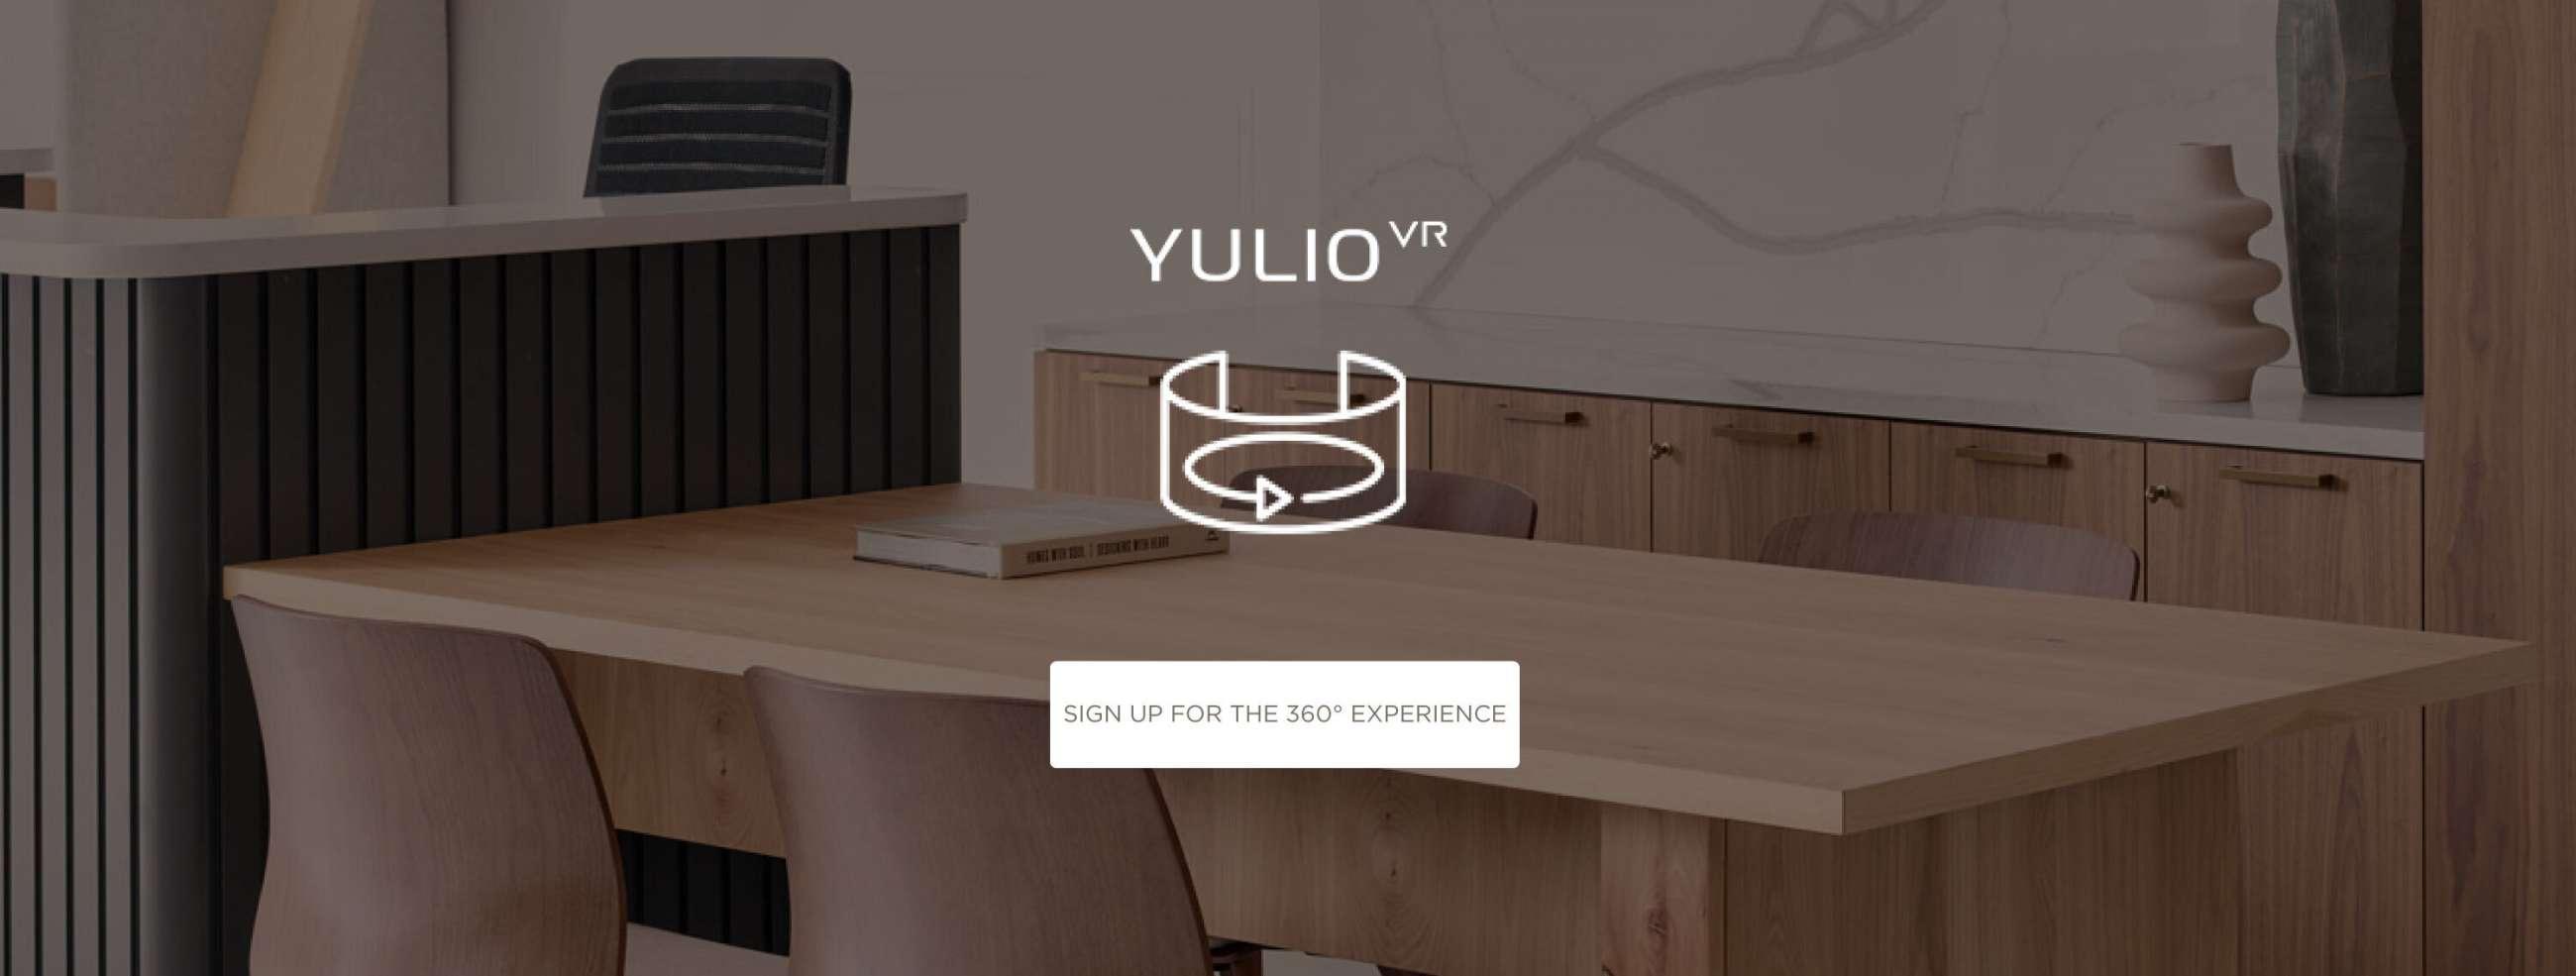 OFS Yulio experience New York showroom